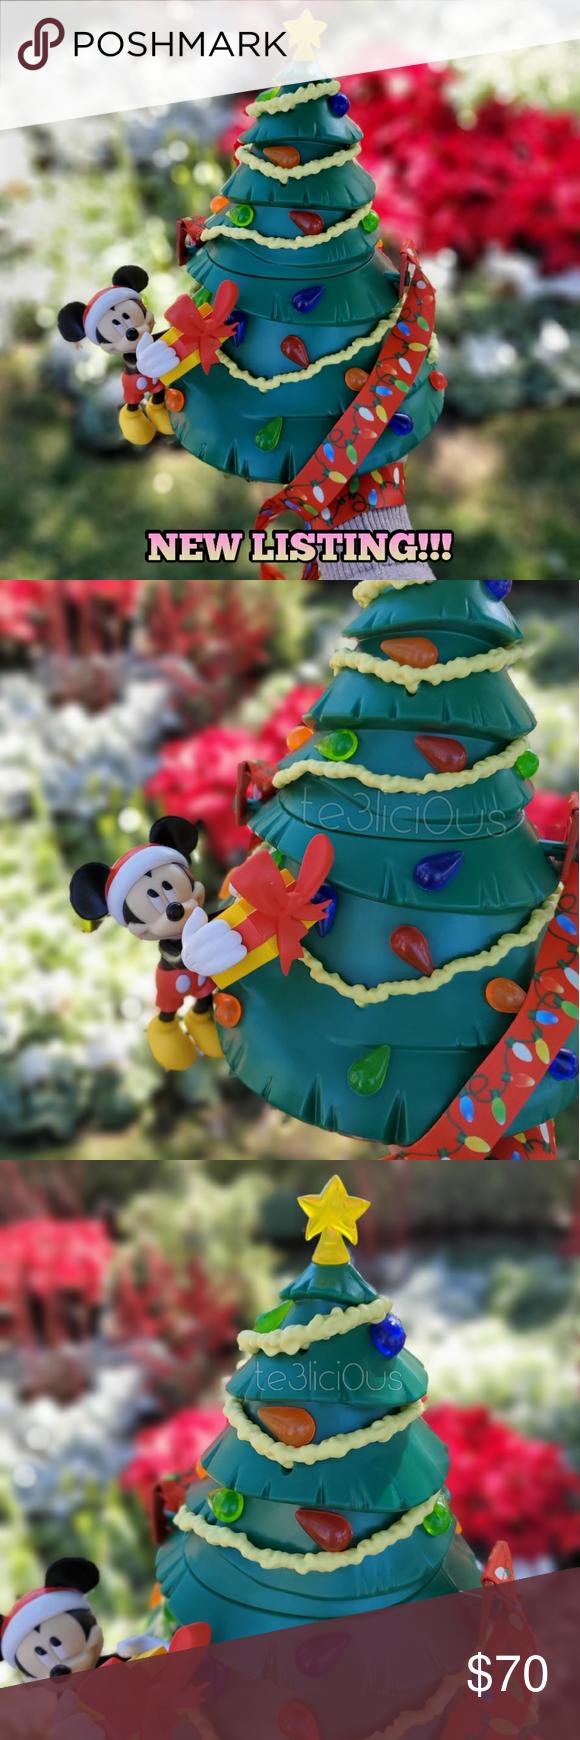 Disney mickey light up tree popcorn bucket nwt | Light up tree, Holiday colors, Disney holiday